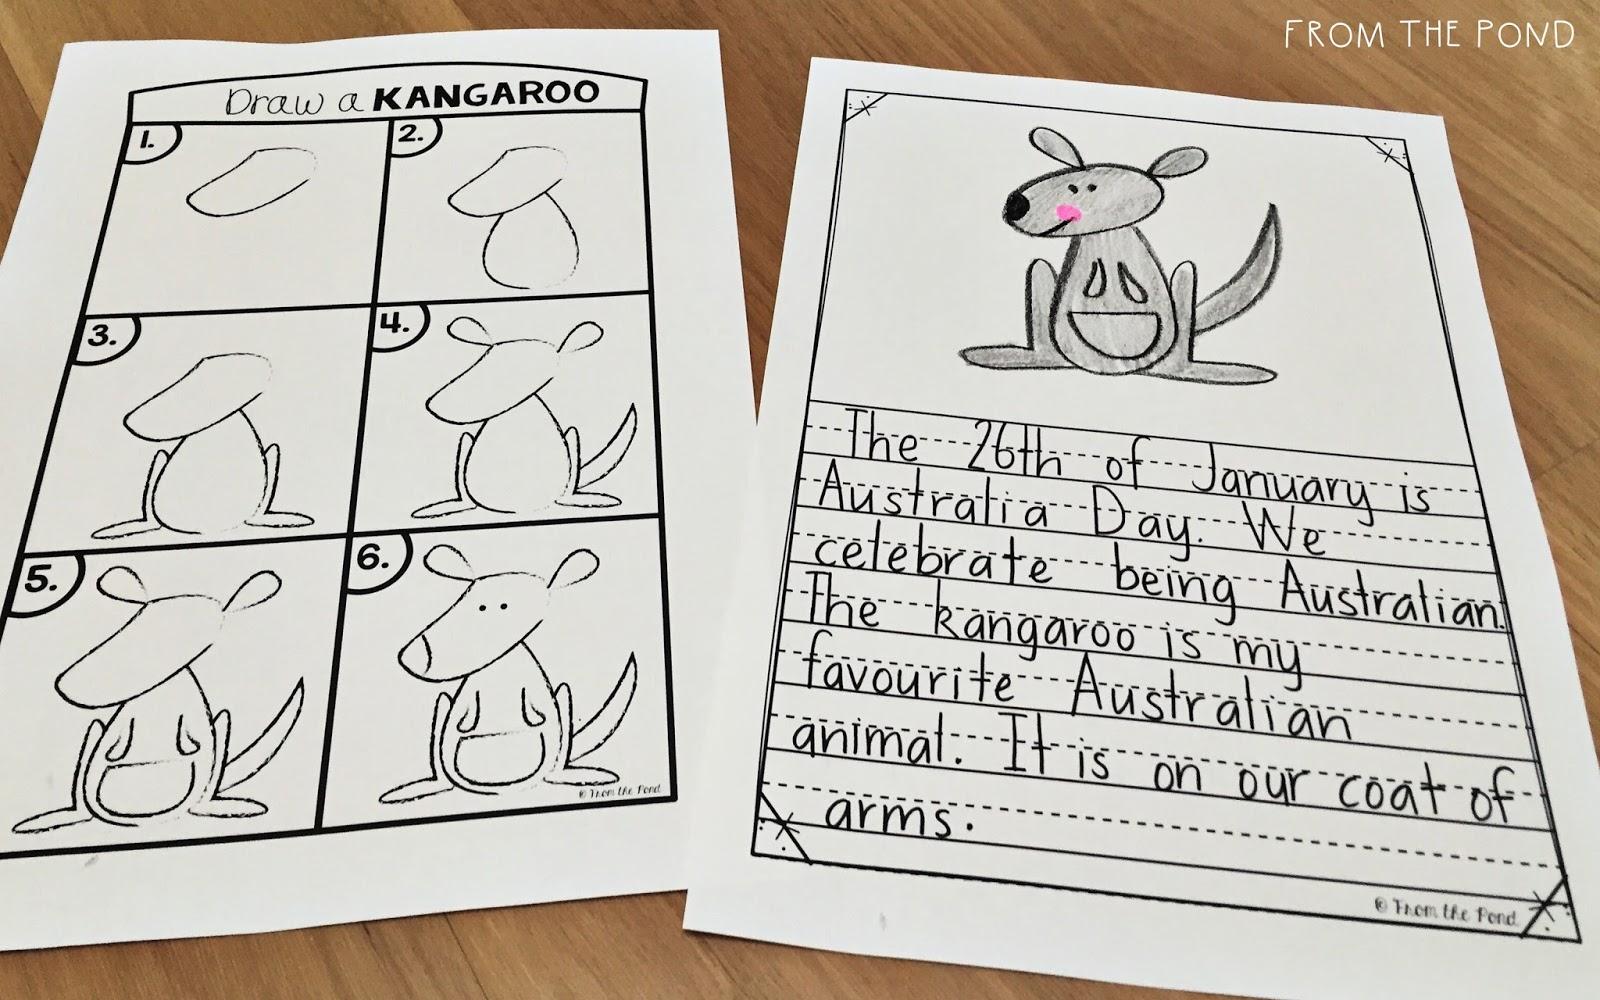 Kangaroo Directed Drawing